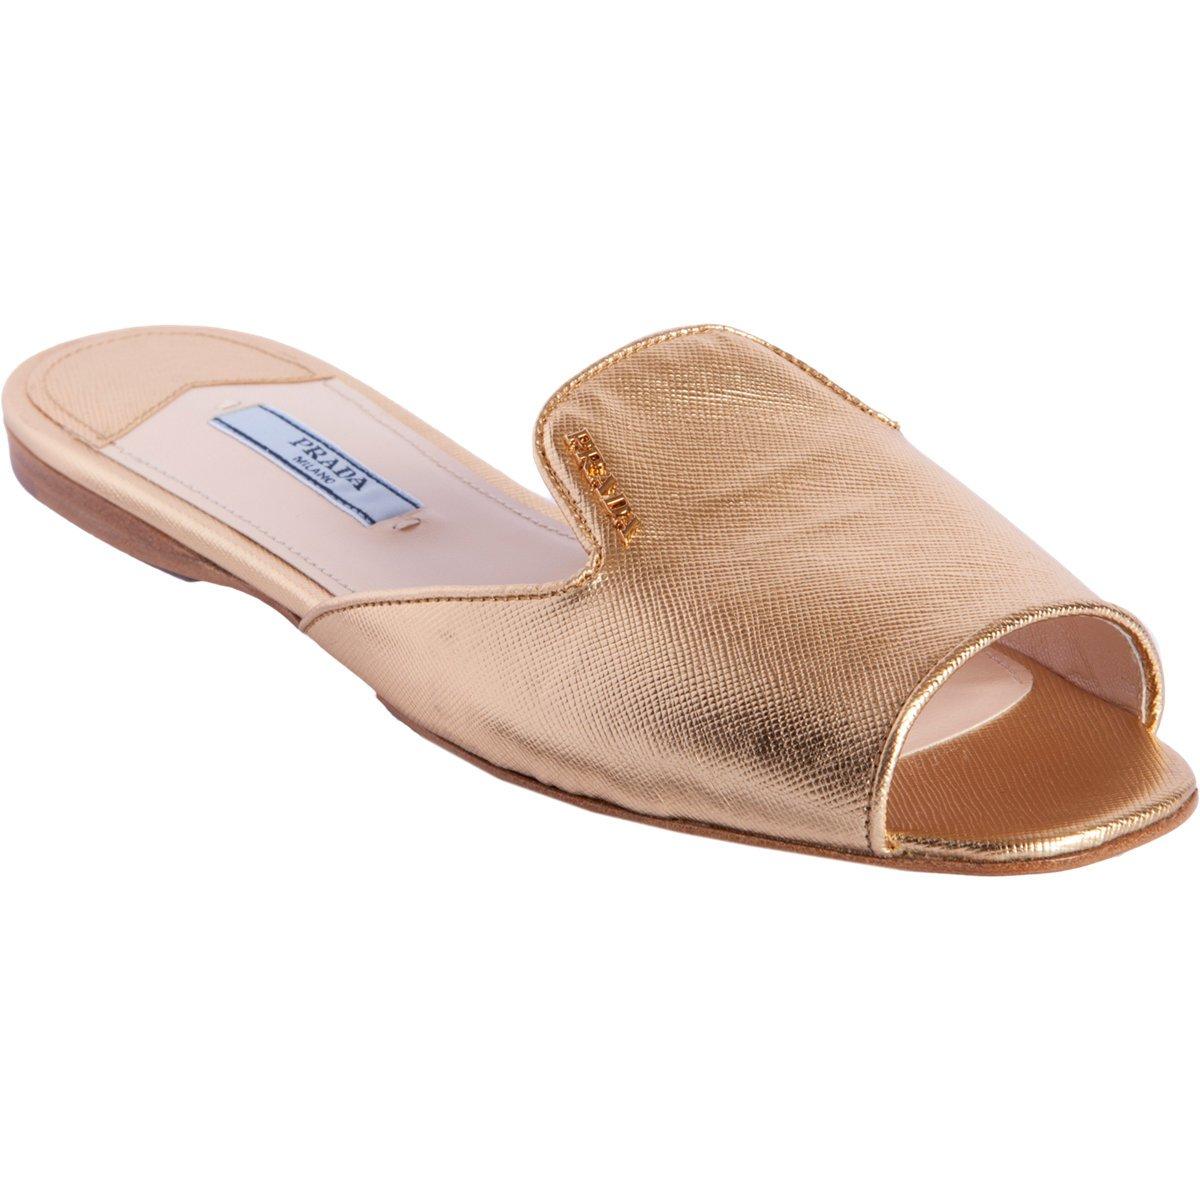 prada look alike sandals